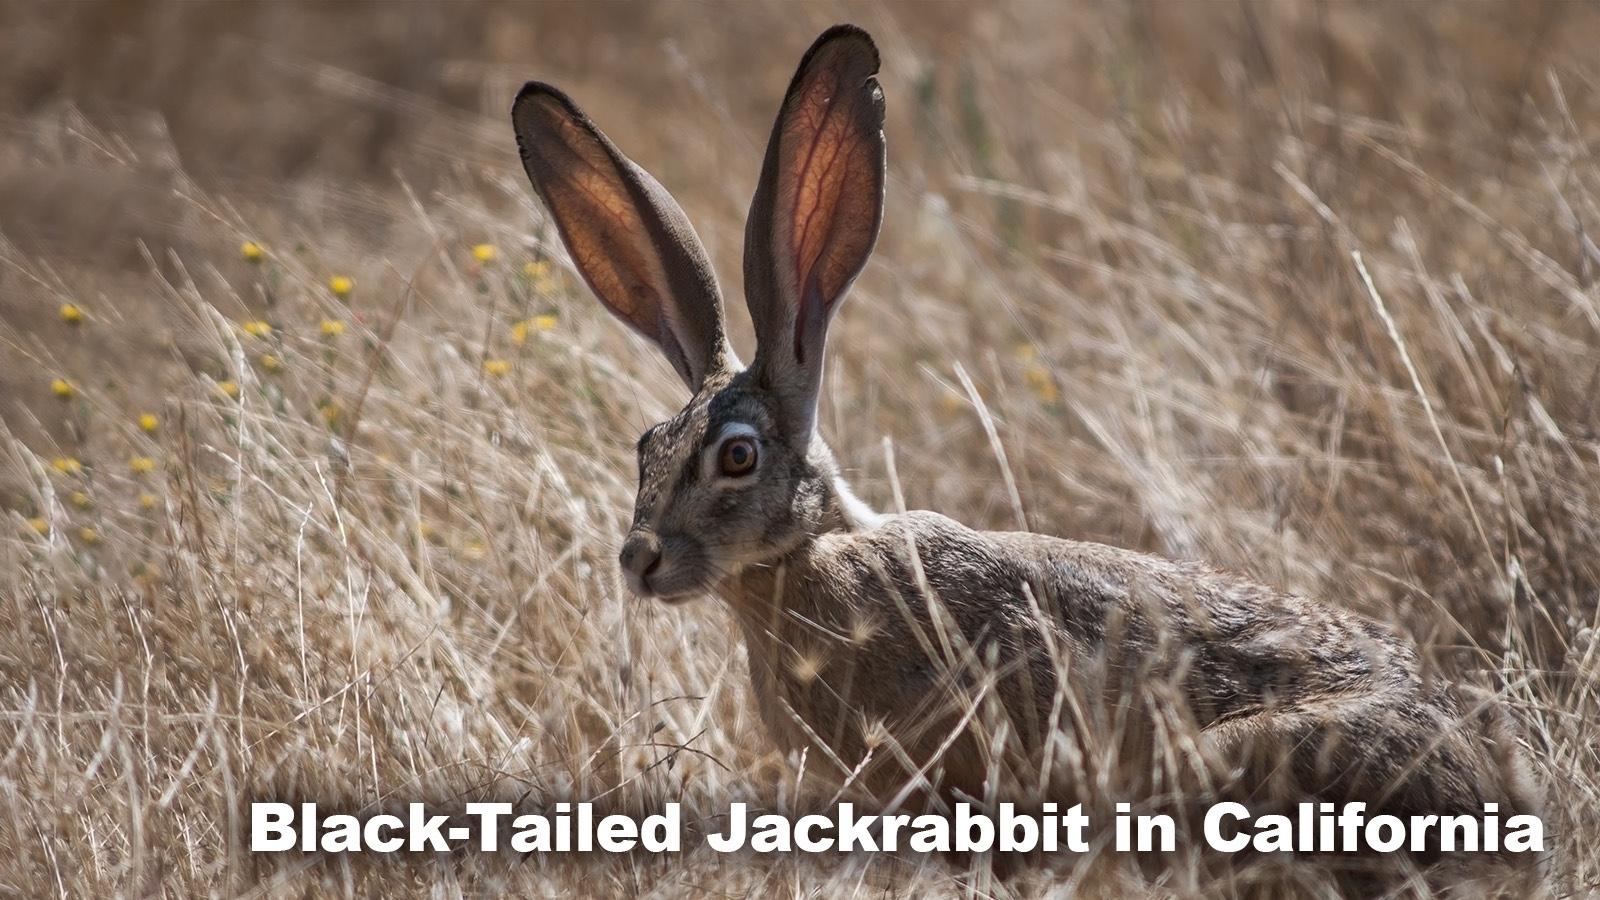 Black-Tailed Jackrabbit in Desert Biome